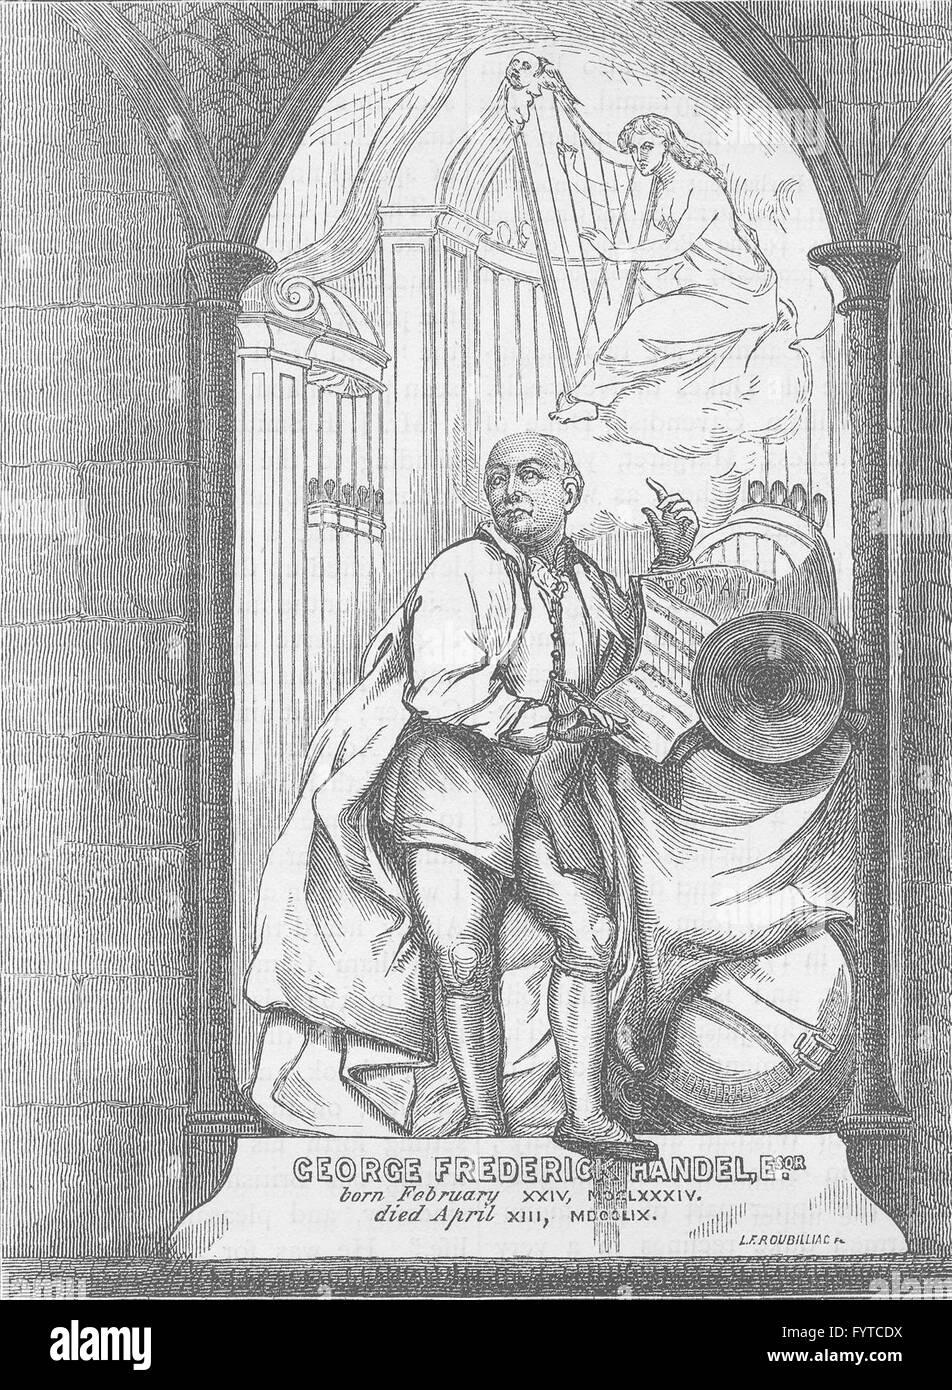 WESTMINSTER ABBEY: Handel's monument. London, antique print c1880 - Stock Image